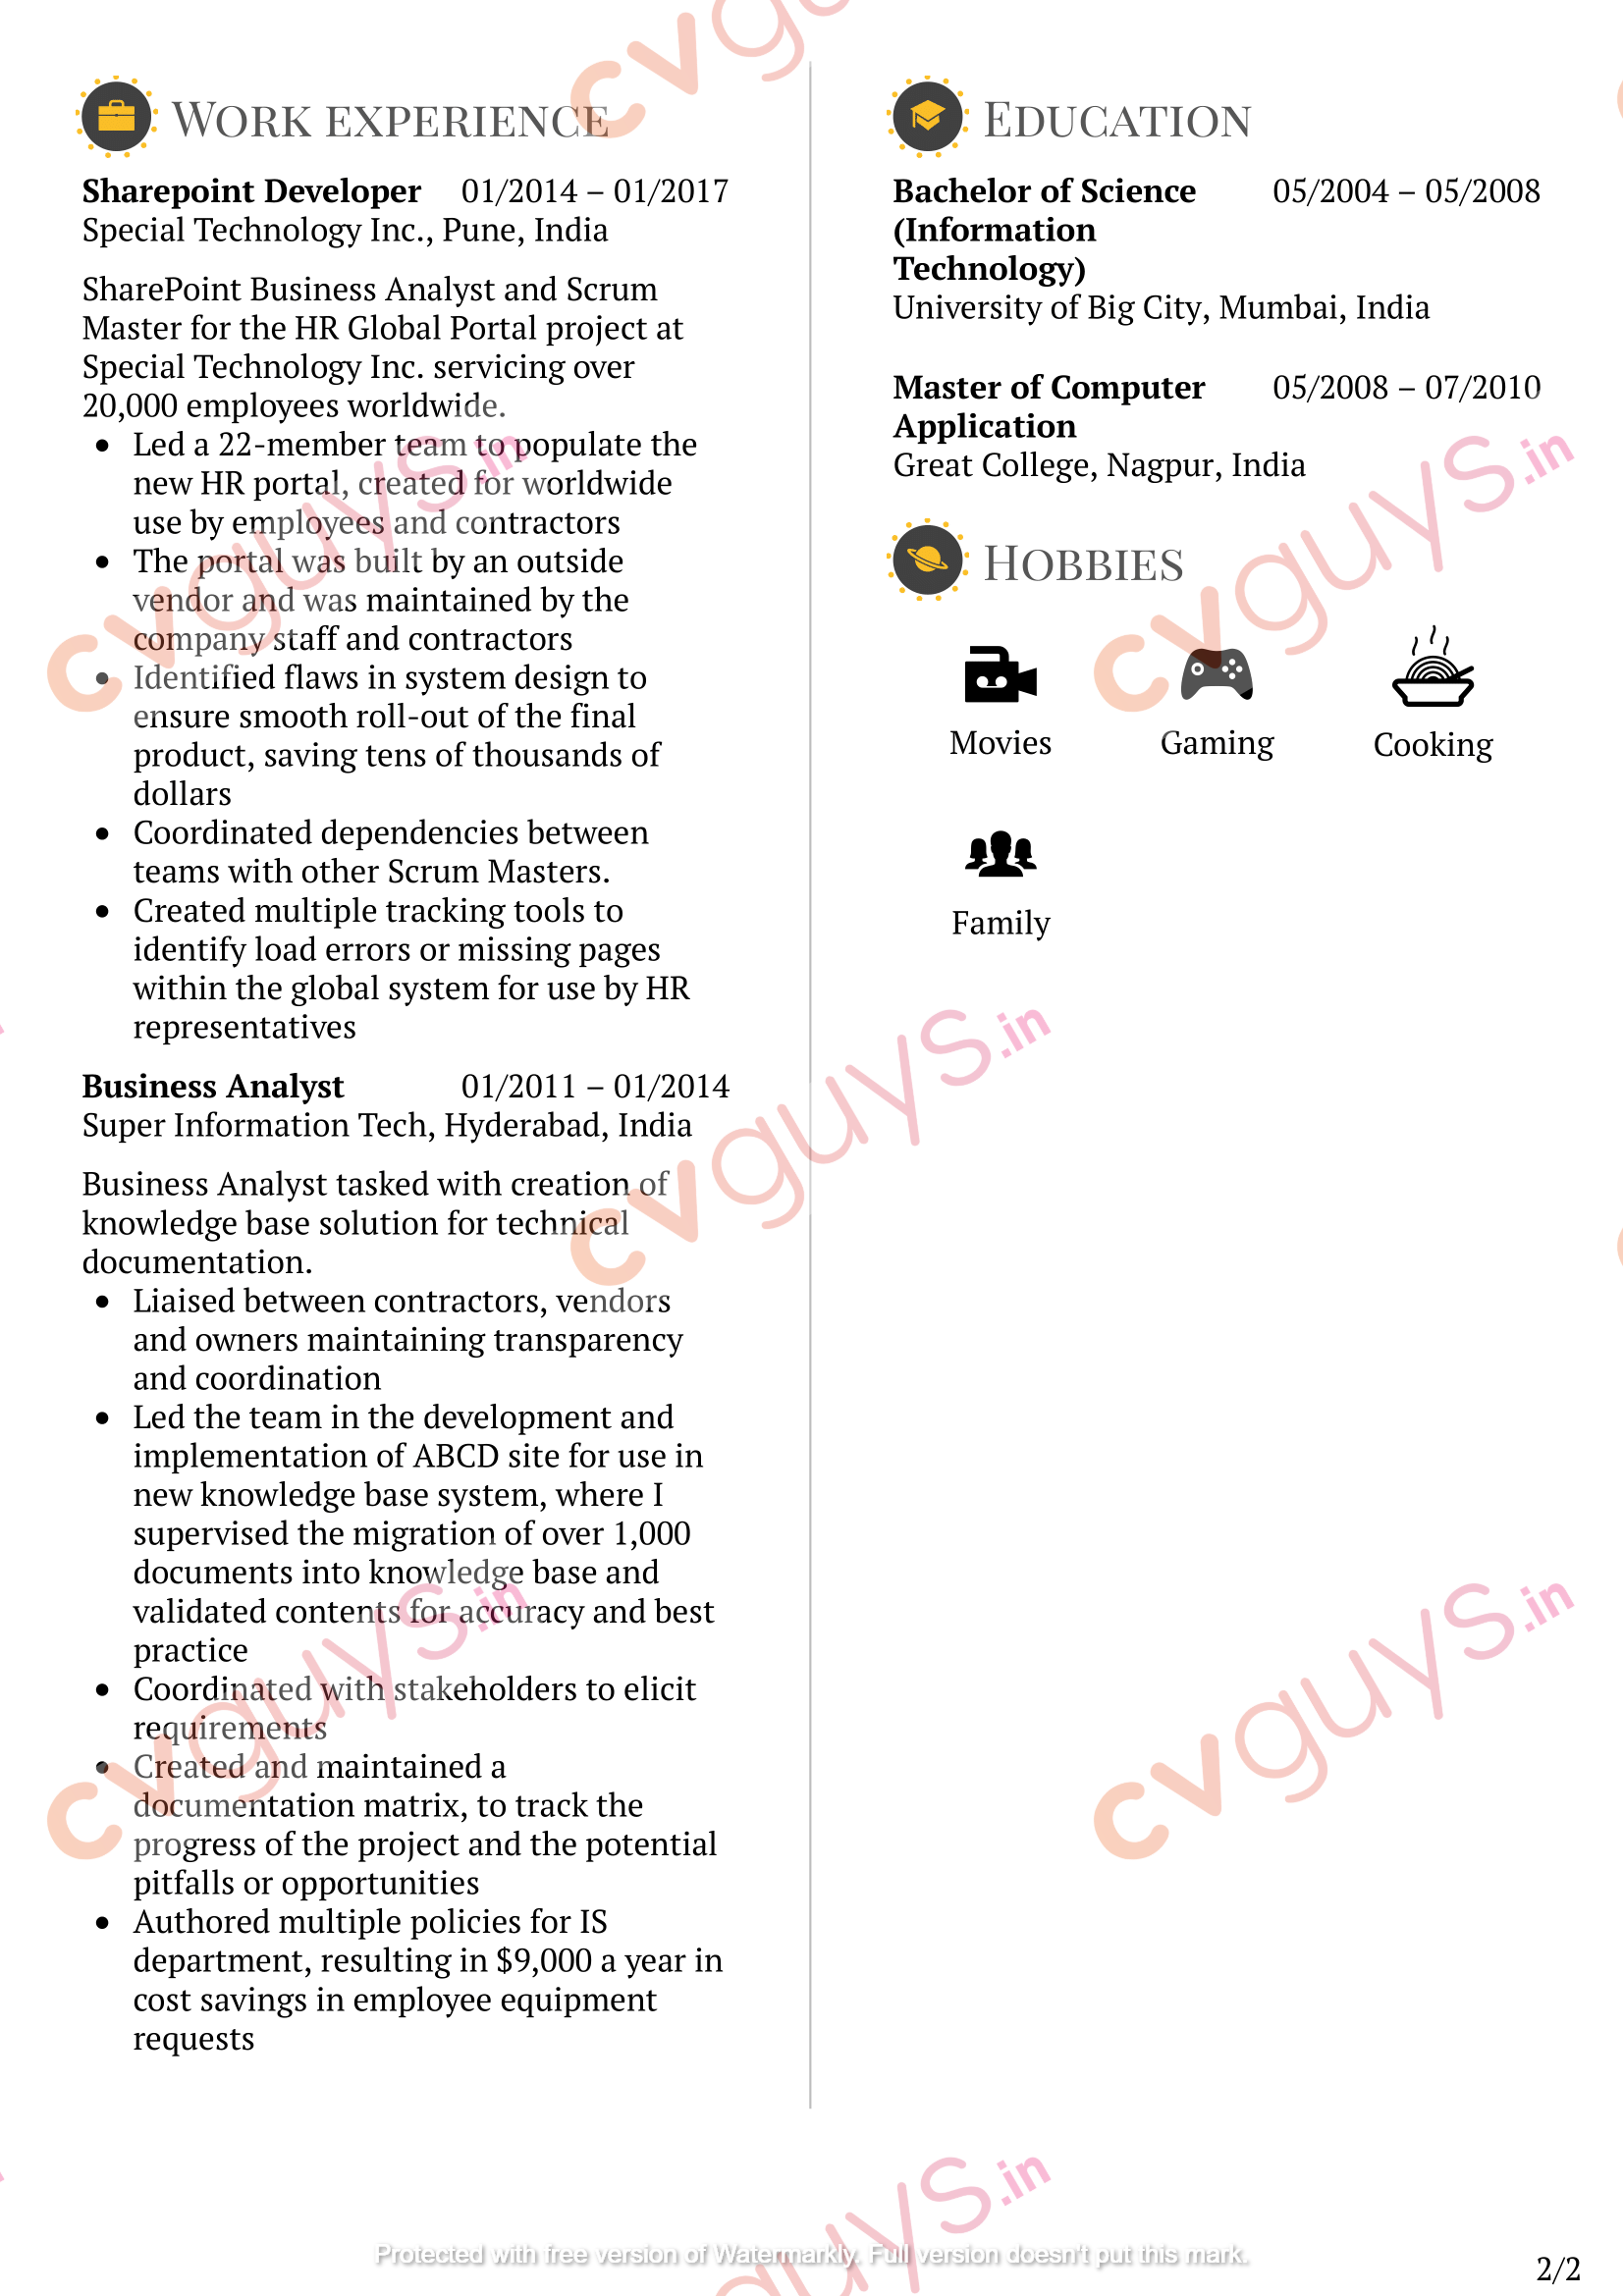 Software Developer Resume Sample by CVGUYS.IN